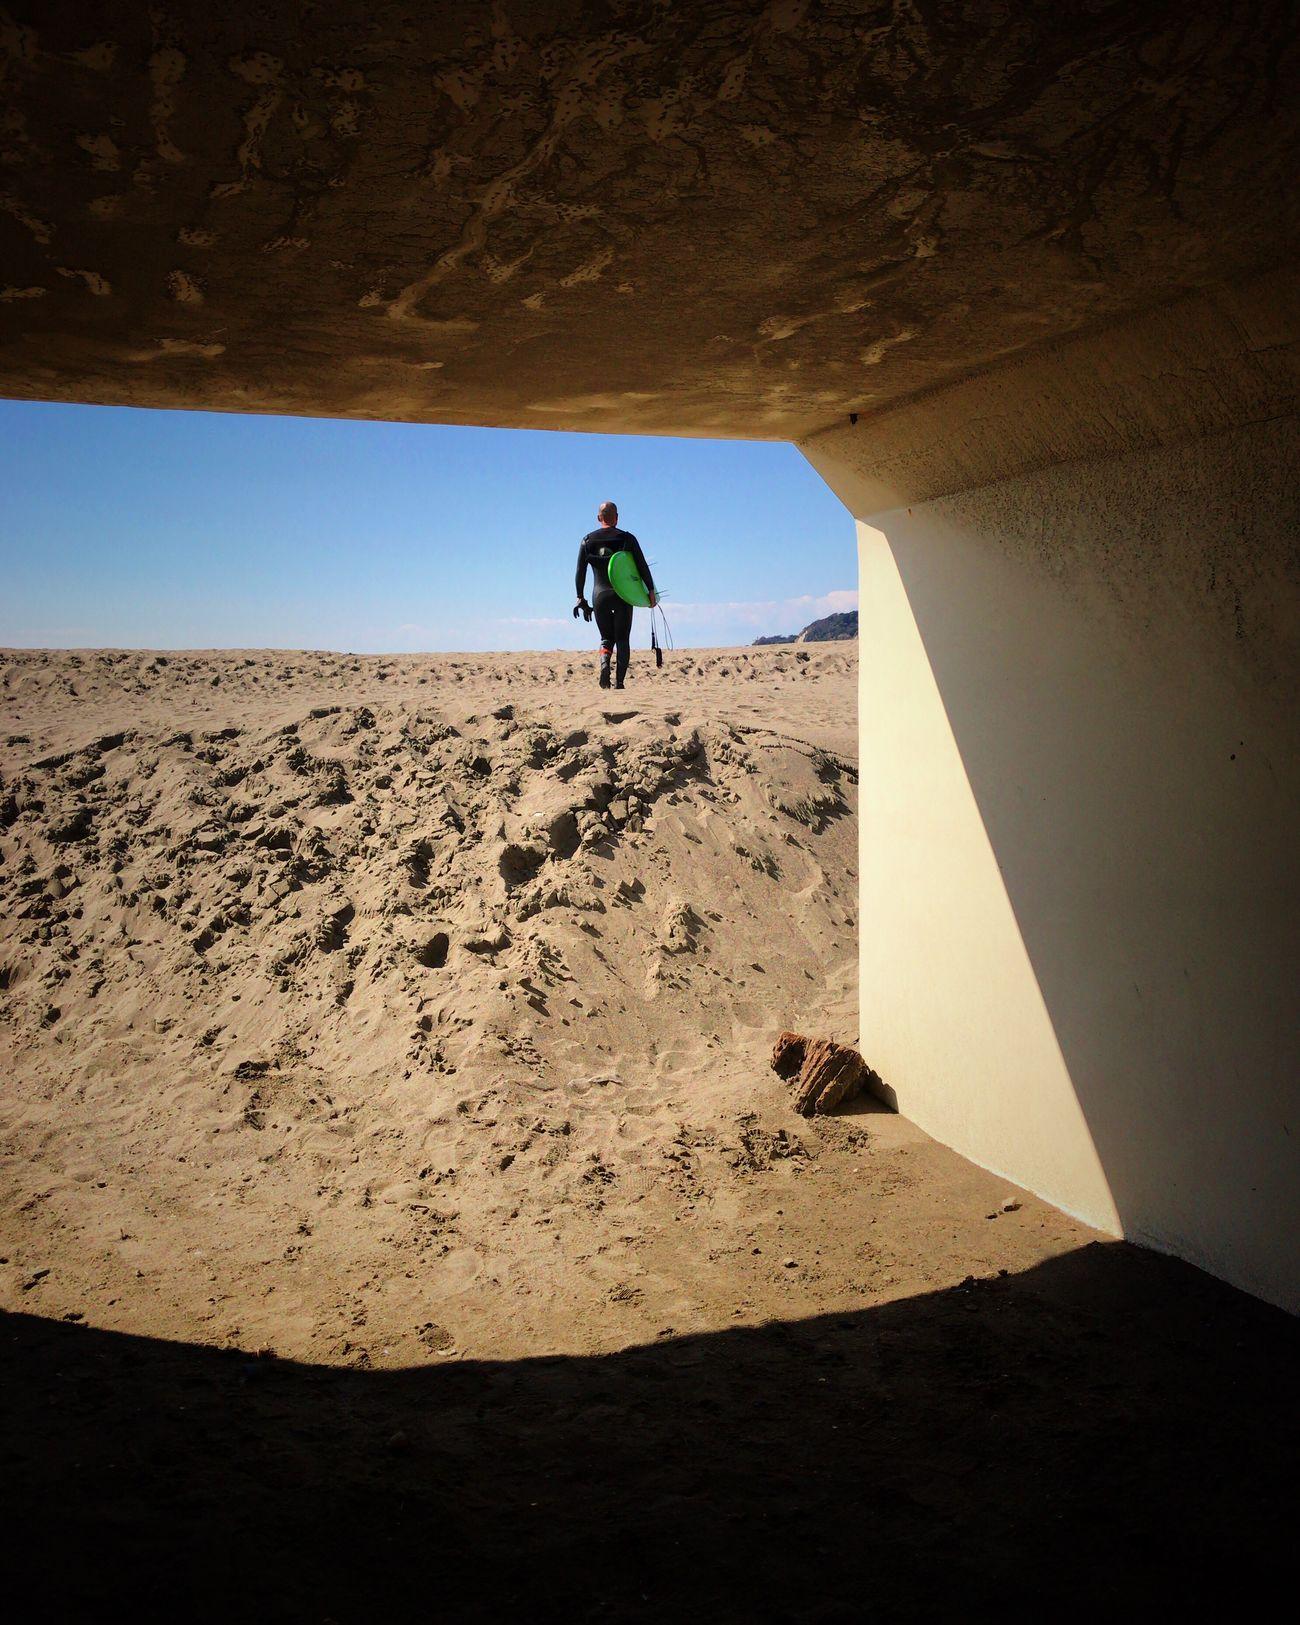 Beachphotography Sand Sunlight River View Beach Tunnel